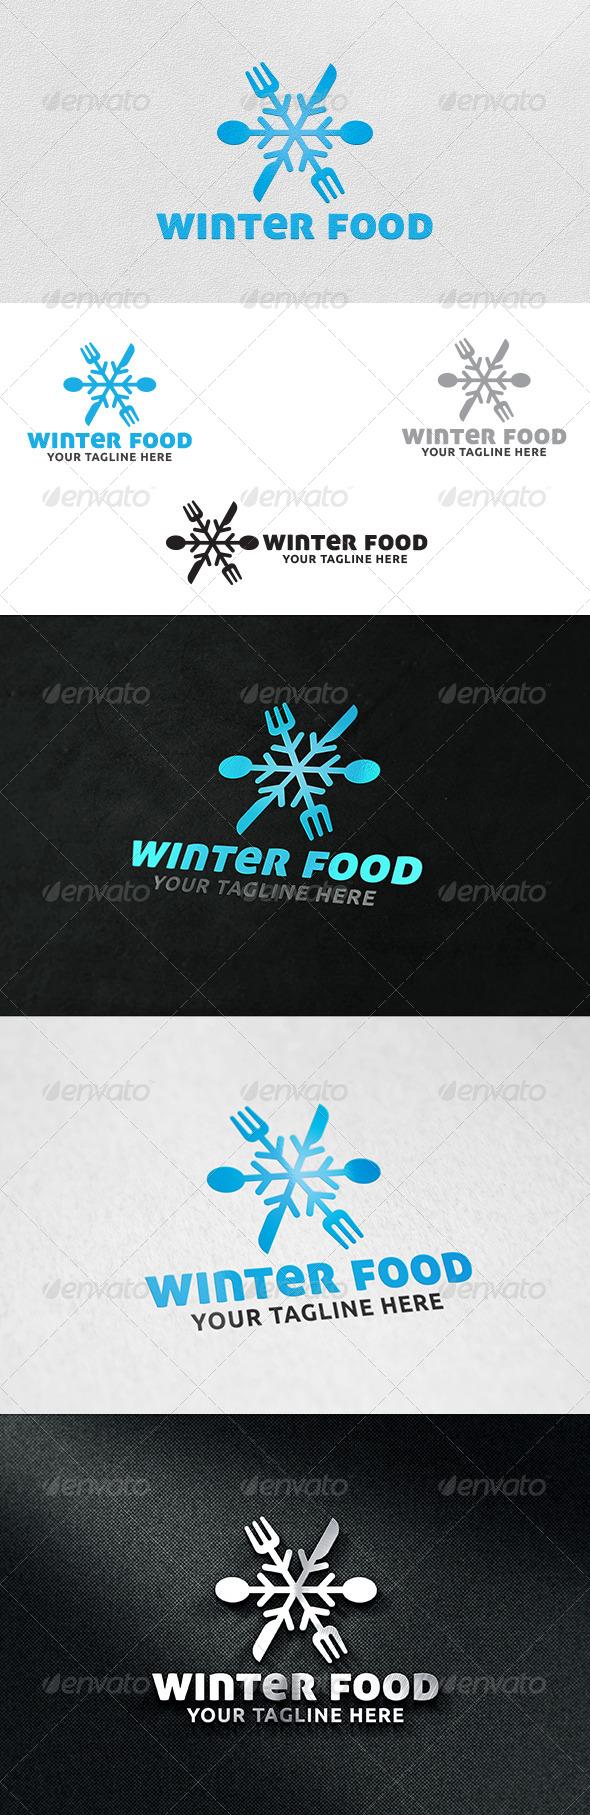 Winter Food V2 - Logo Template